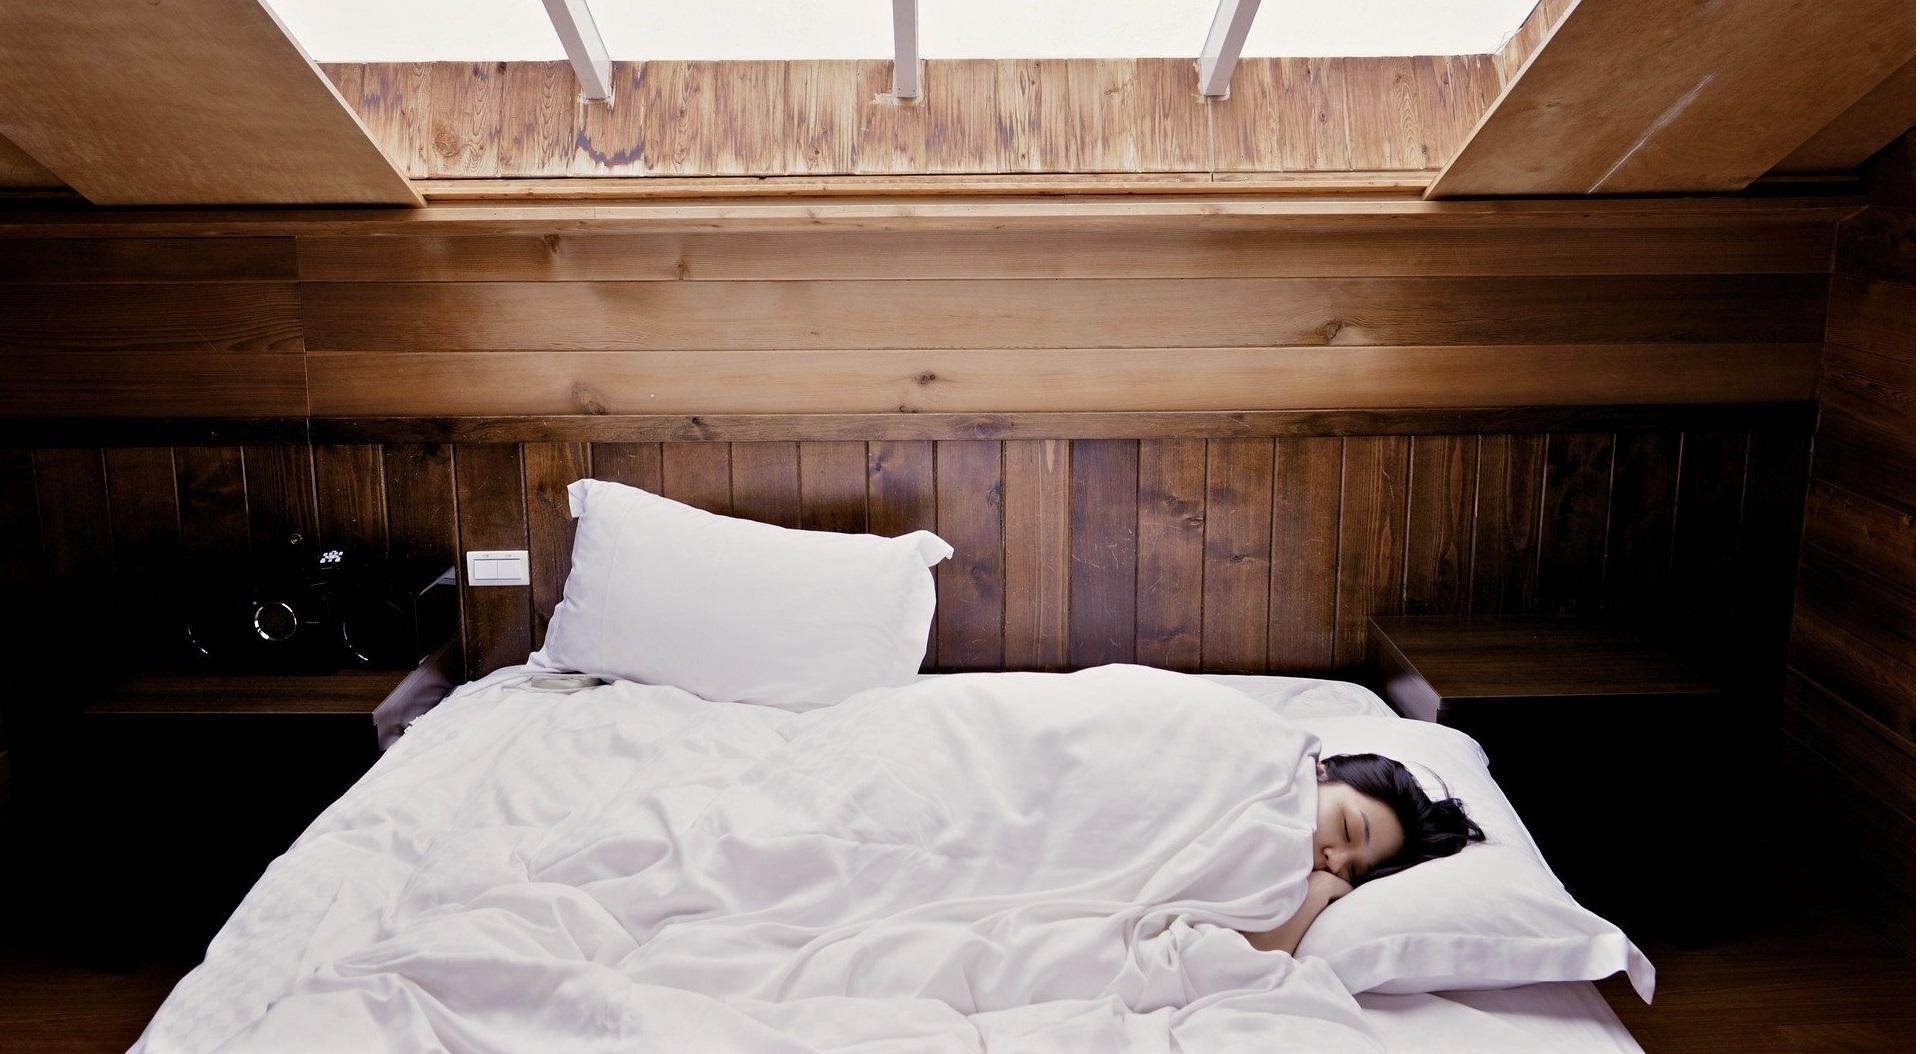 sleep-1209288_1920_1